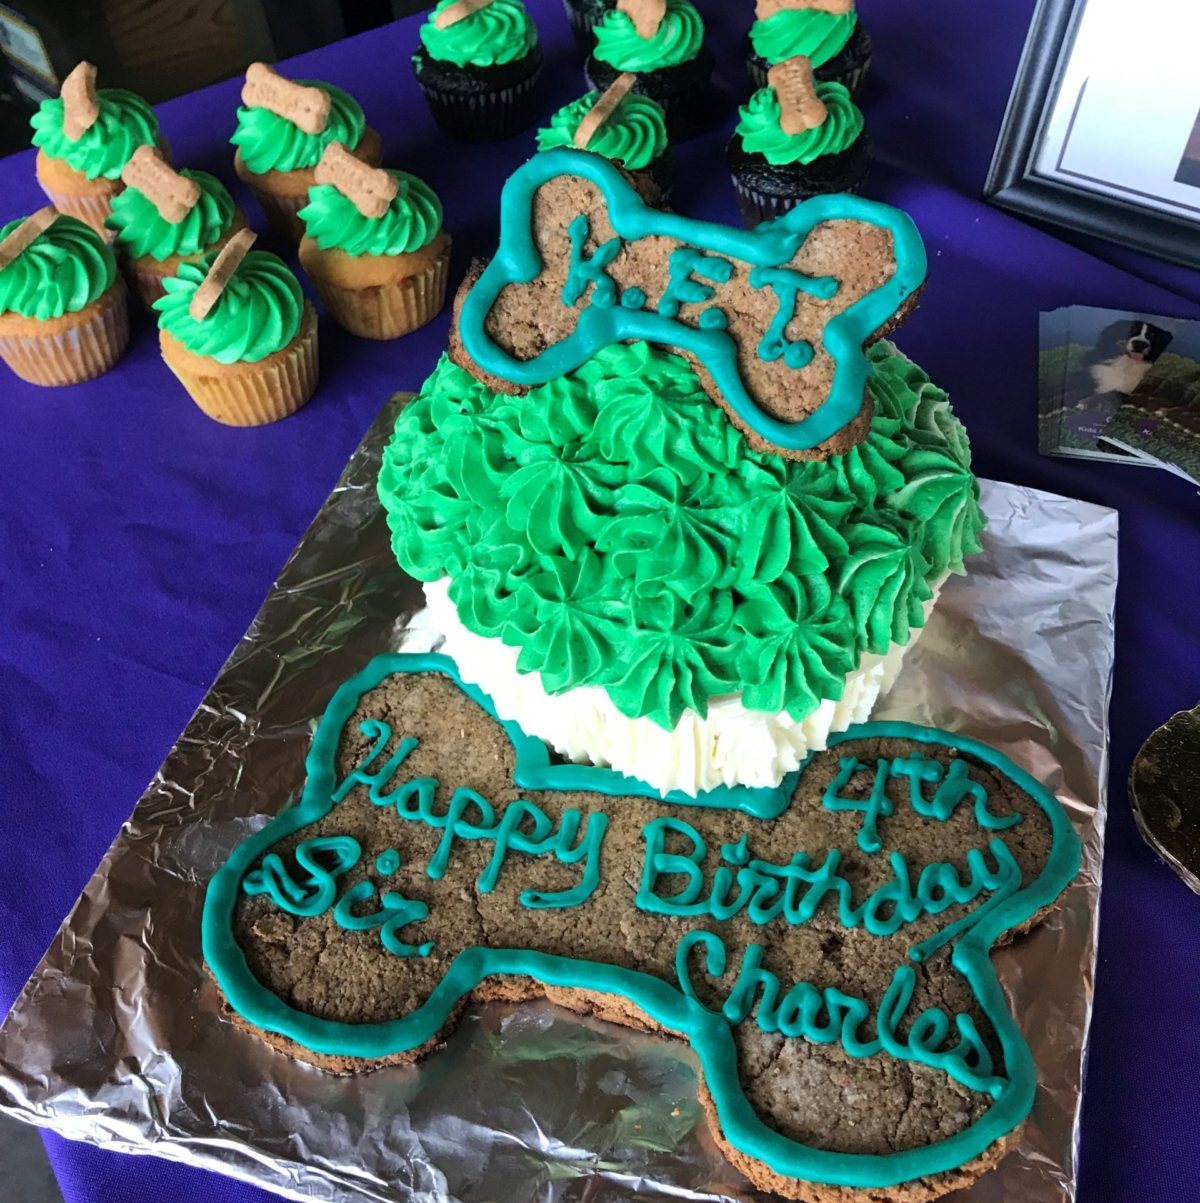 Charles' cake